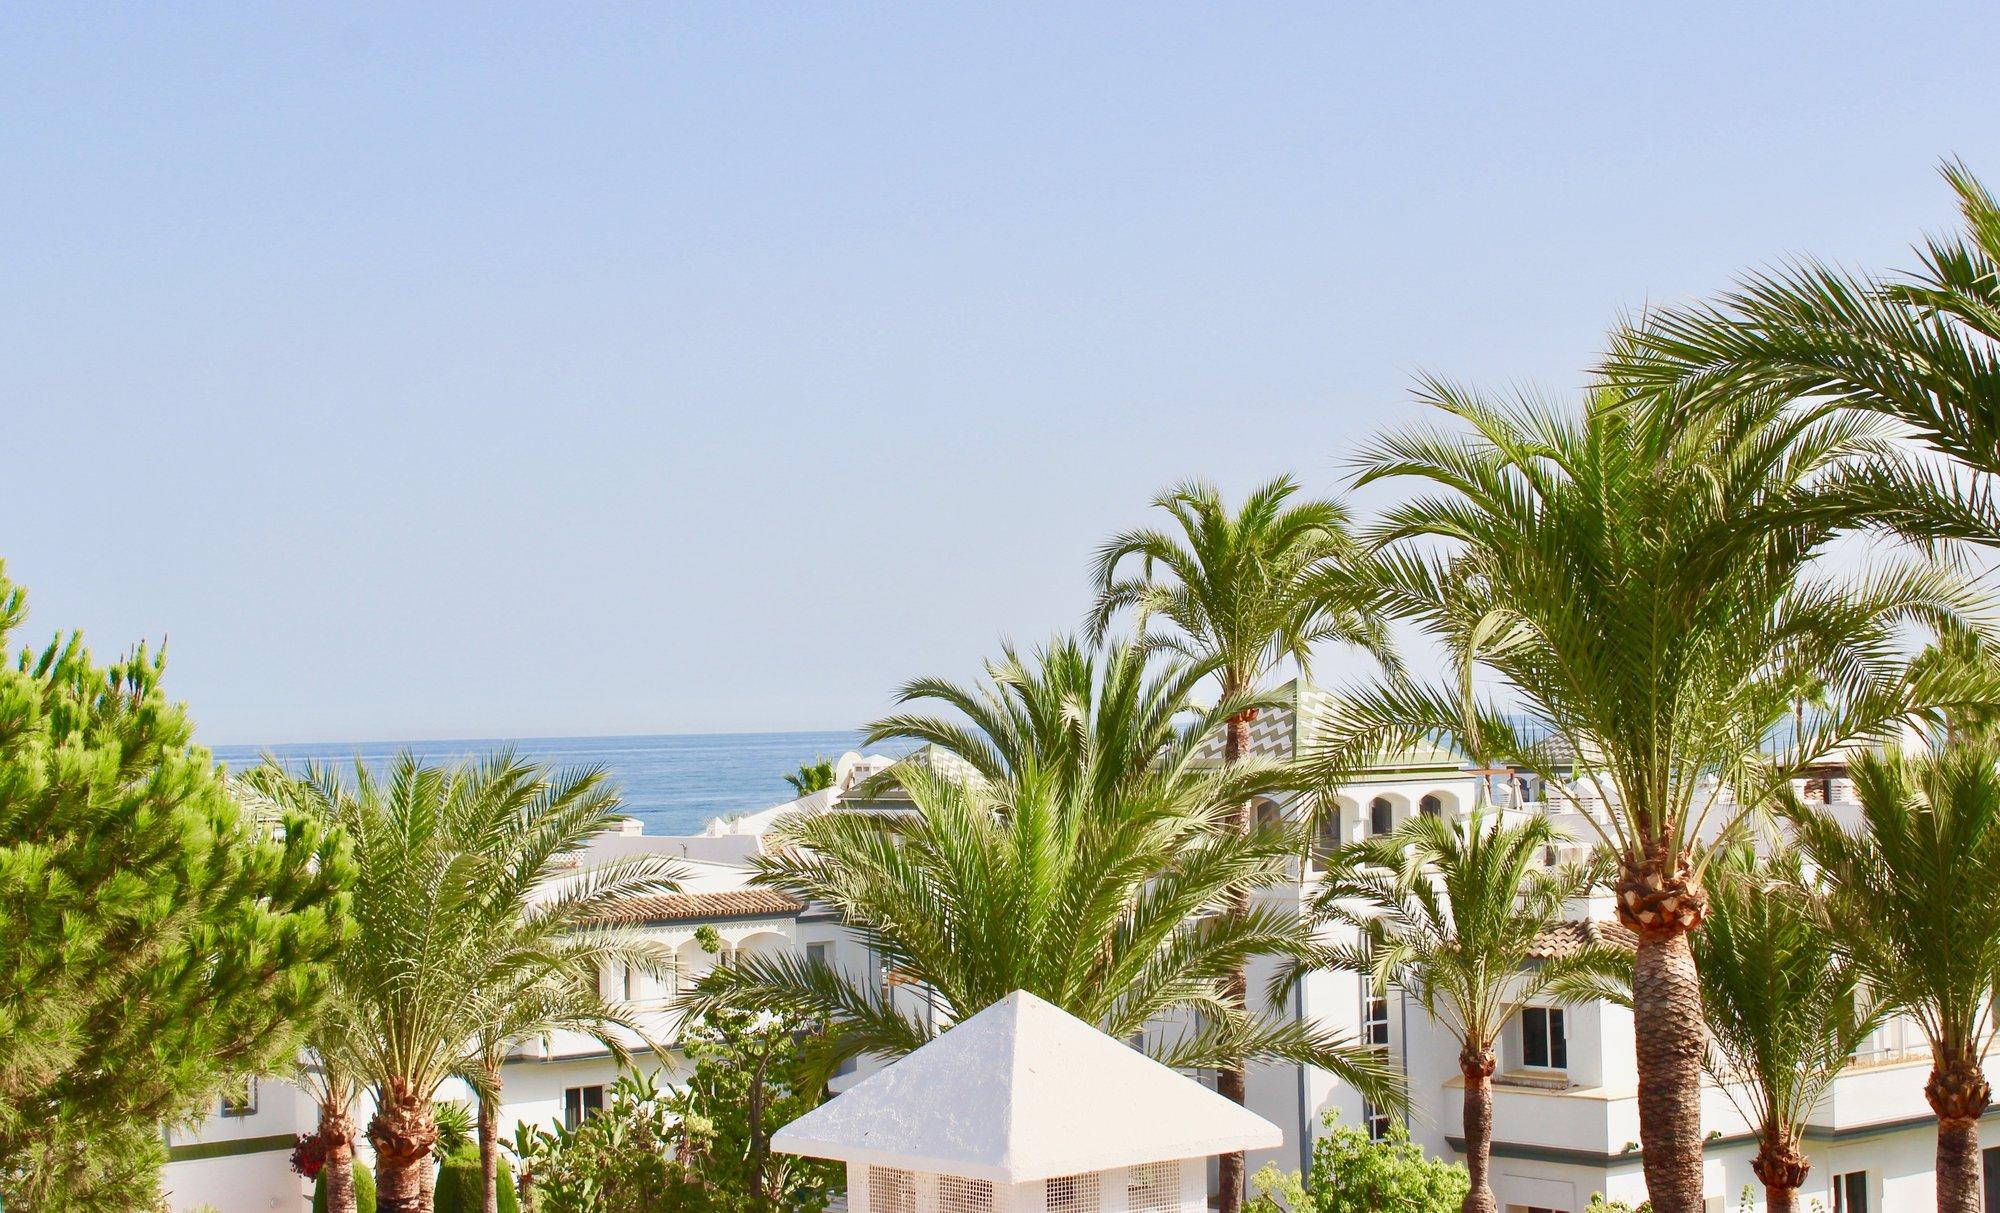 Penthouse for sale in Estepona, Dominion Beach